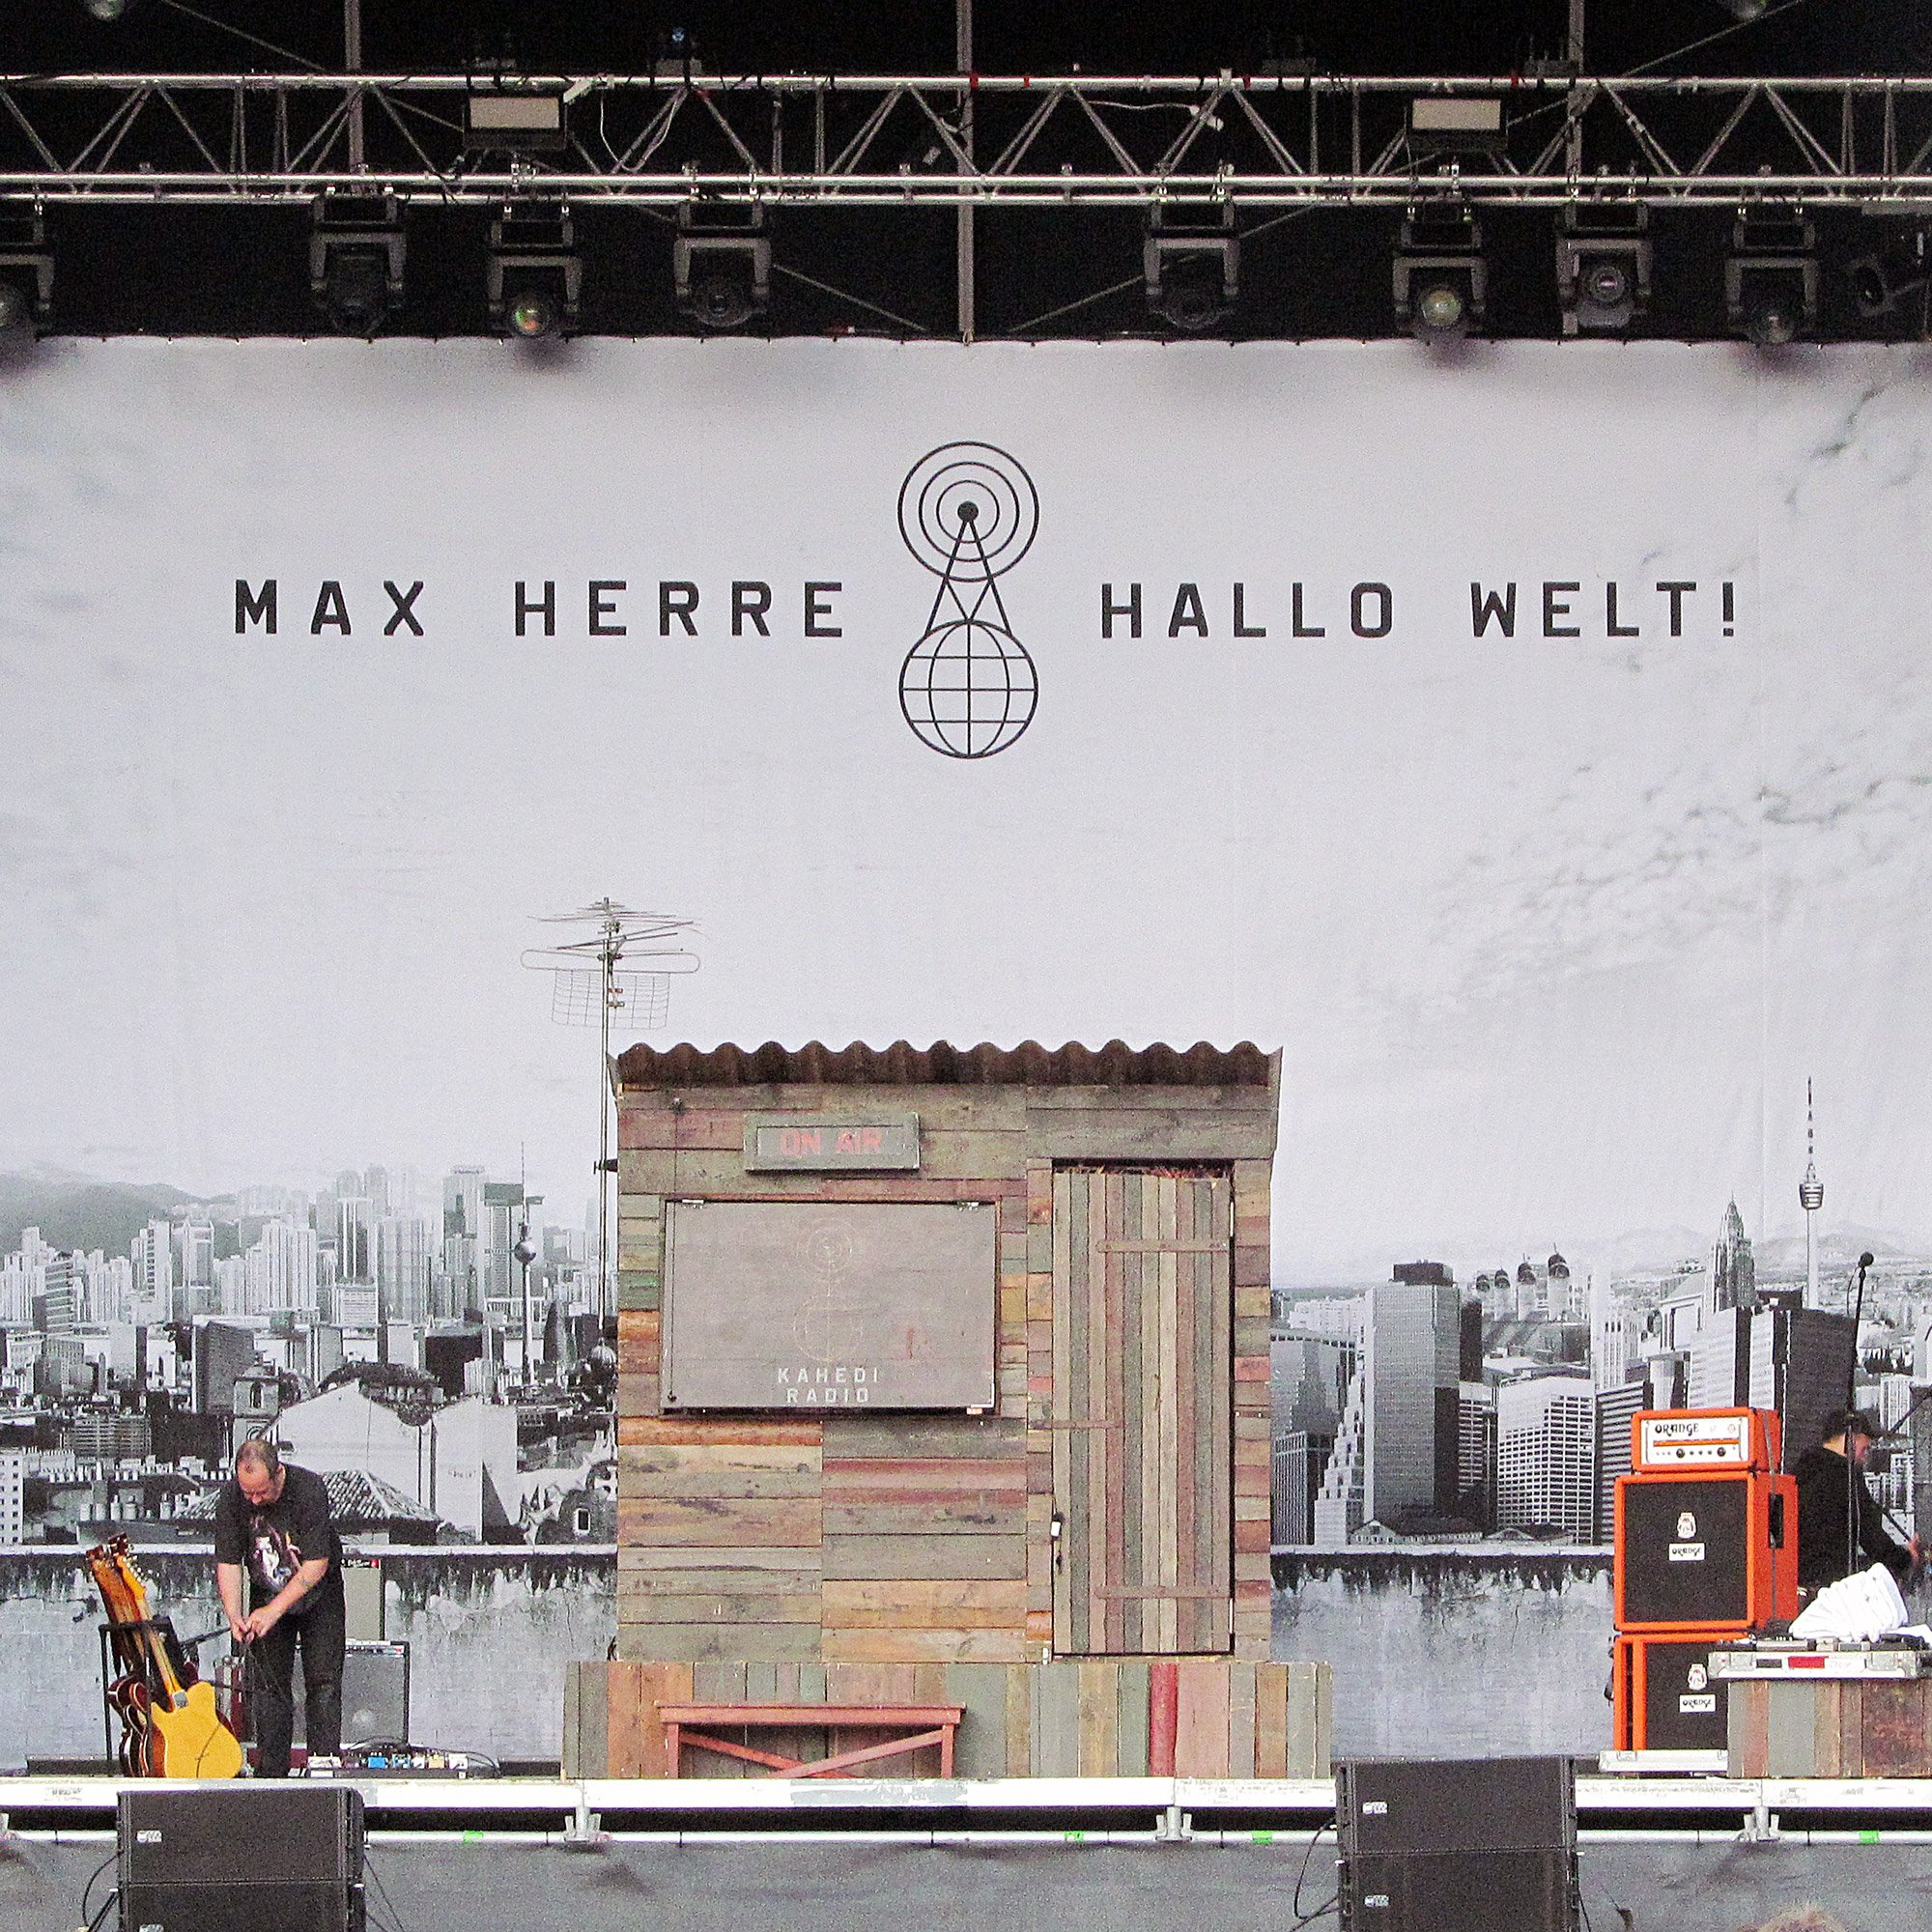 Hurricane Festival: Max Herre